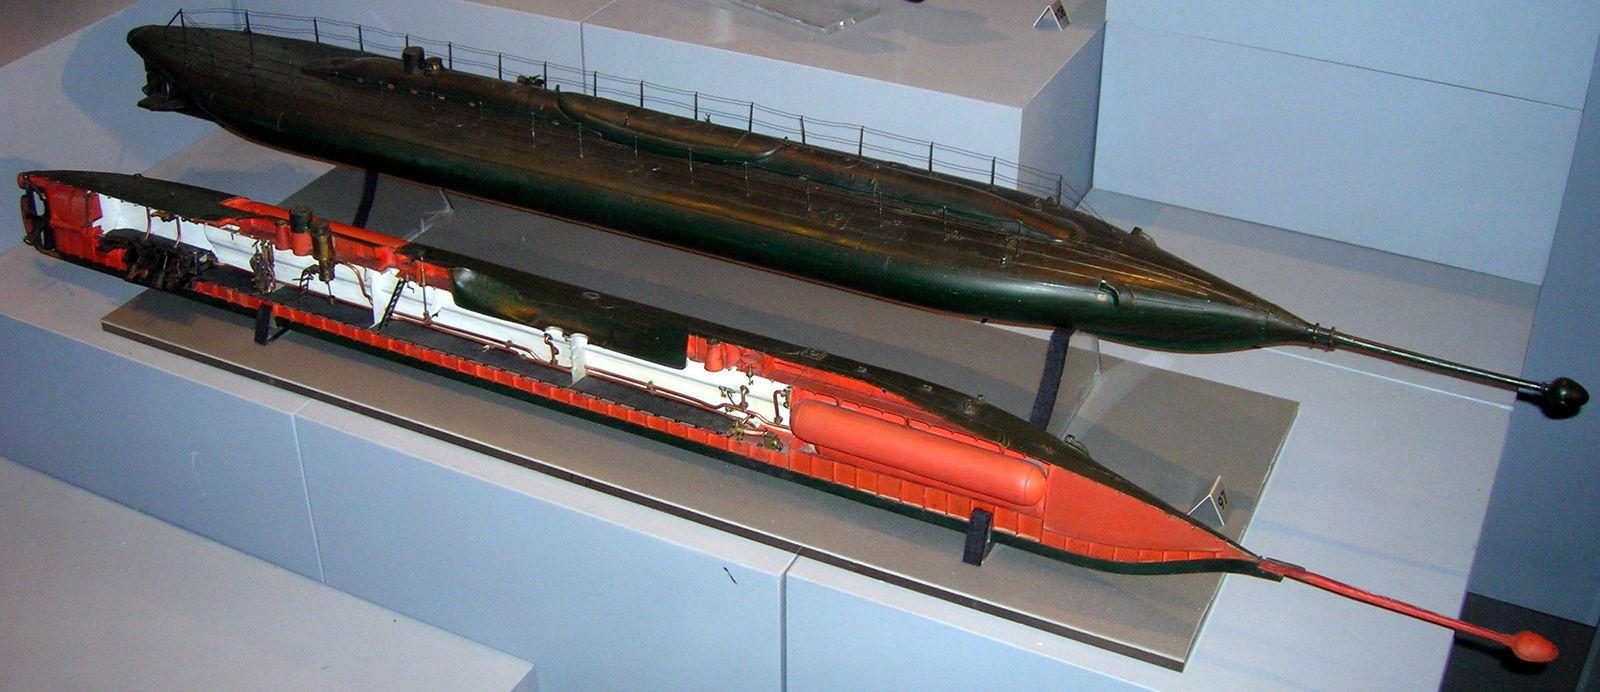 1600px-Le_plongeur_submarine_model.jpg